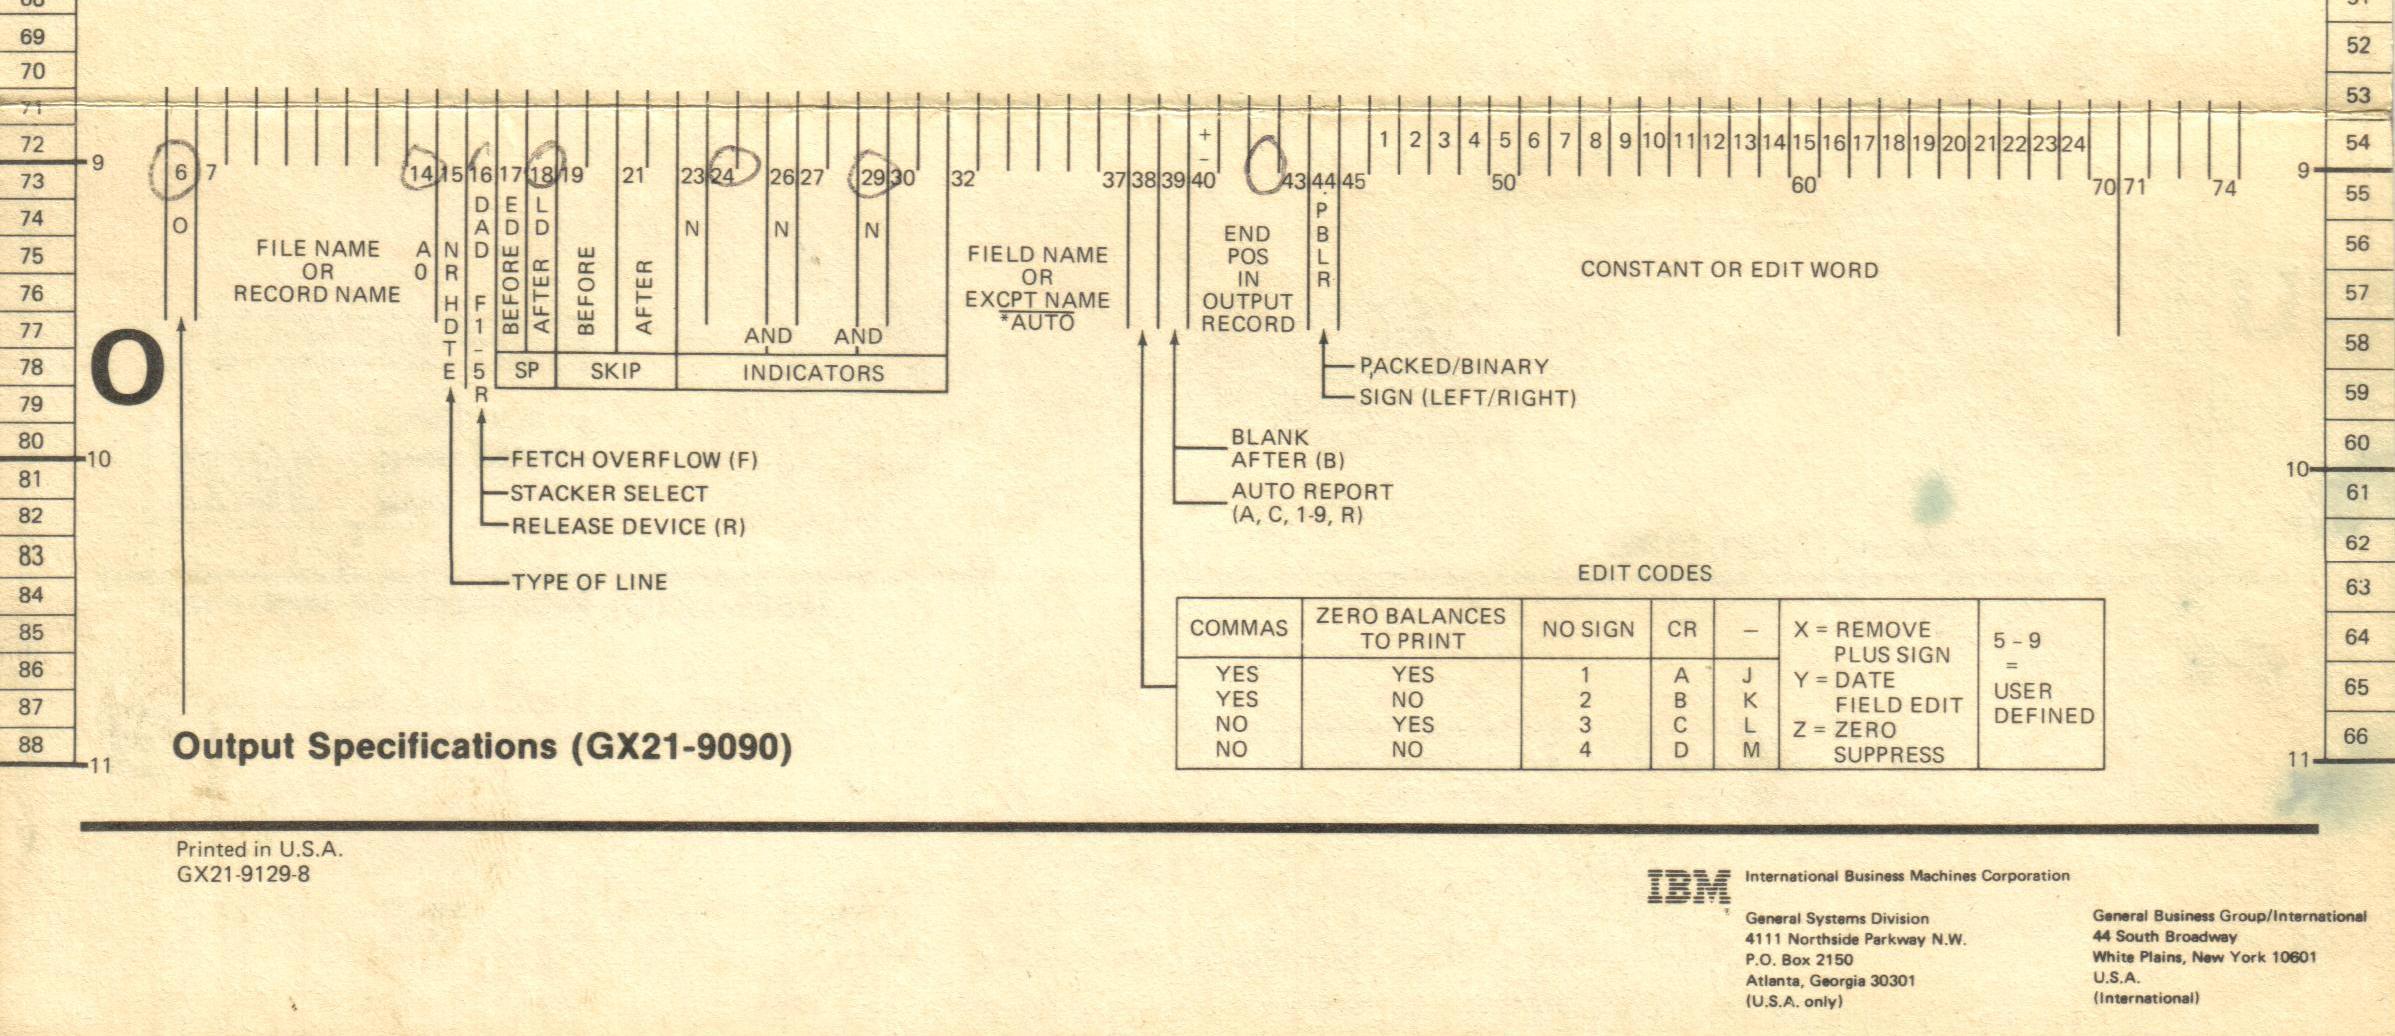 A brief history of the IBM RPG Programming Language 1